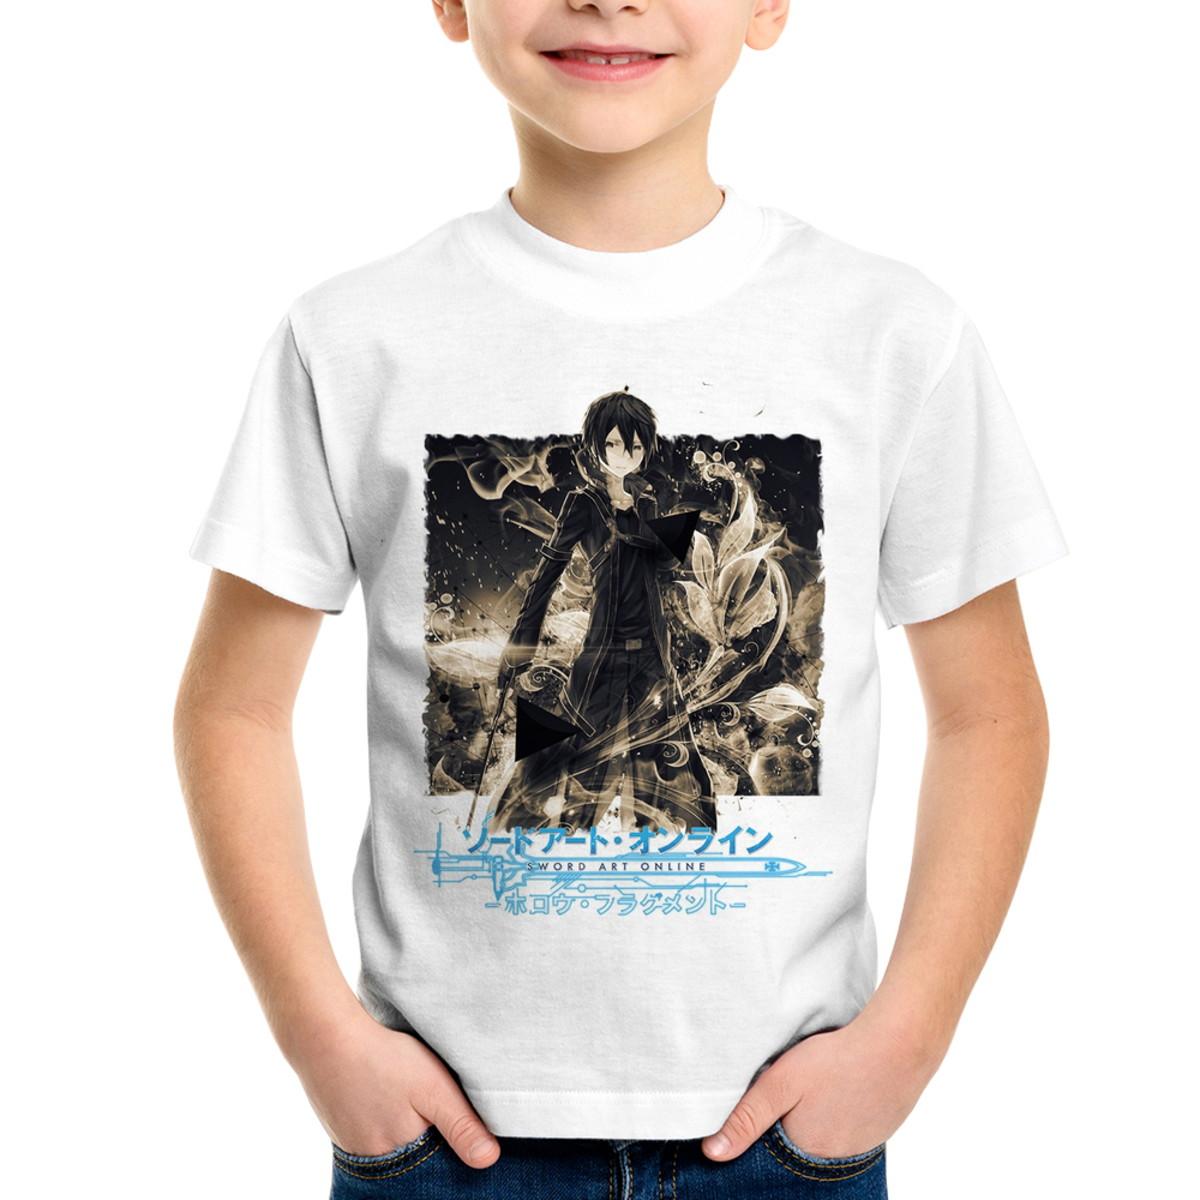 5d7a25af0 Camiseta Infantil Sword Art Online Kirito Kazuto Kirigaya no Elo7 ...